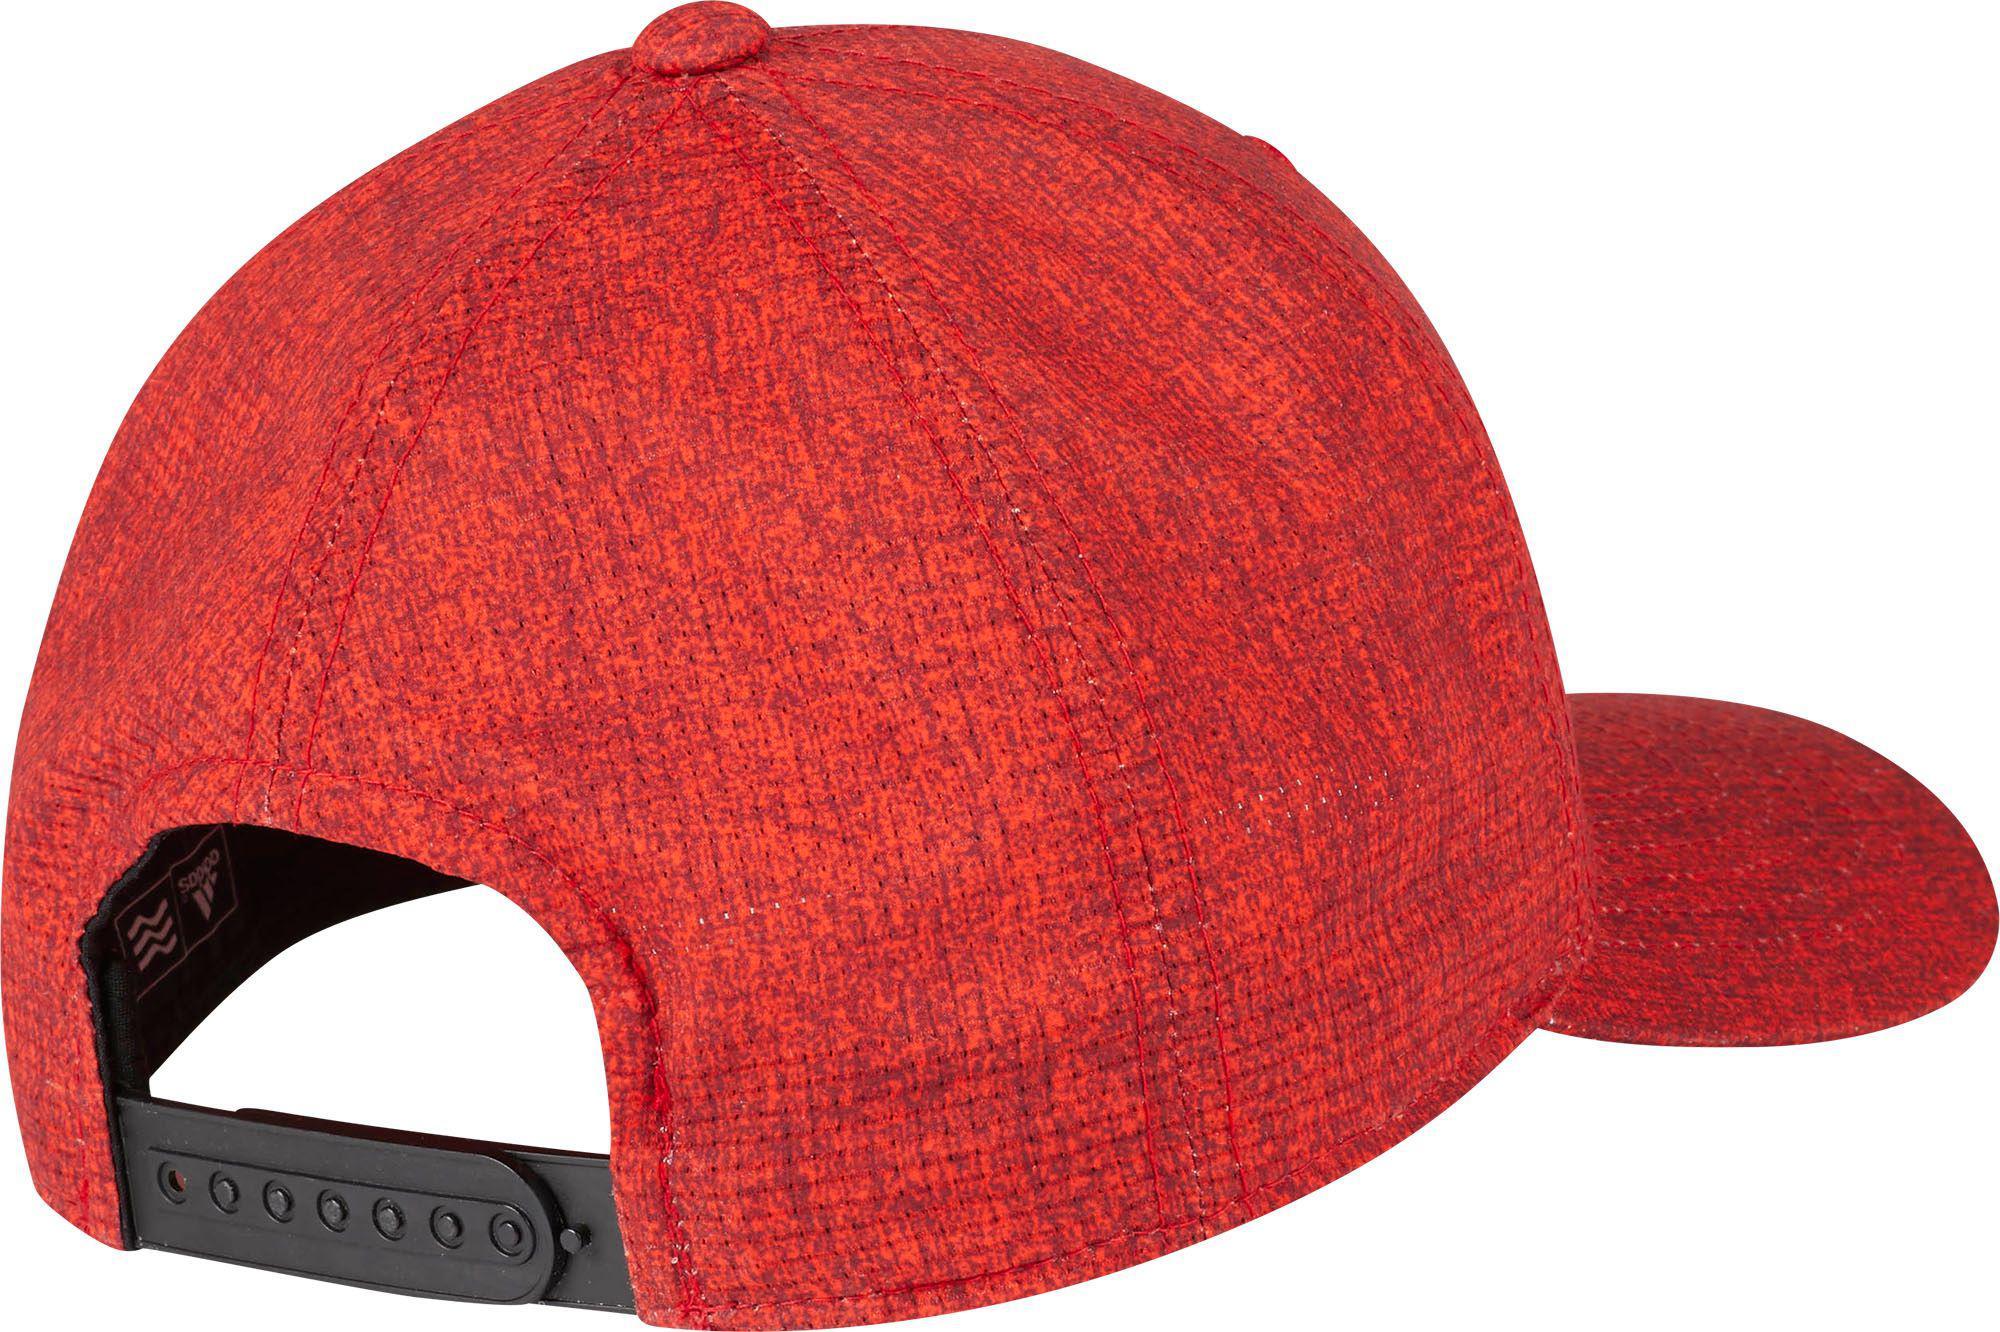 Adidas - Heathered Snapback Golf Hat for Men - Lyst. View fullscreen 6629c9cd5d8d